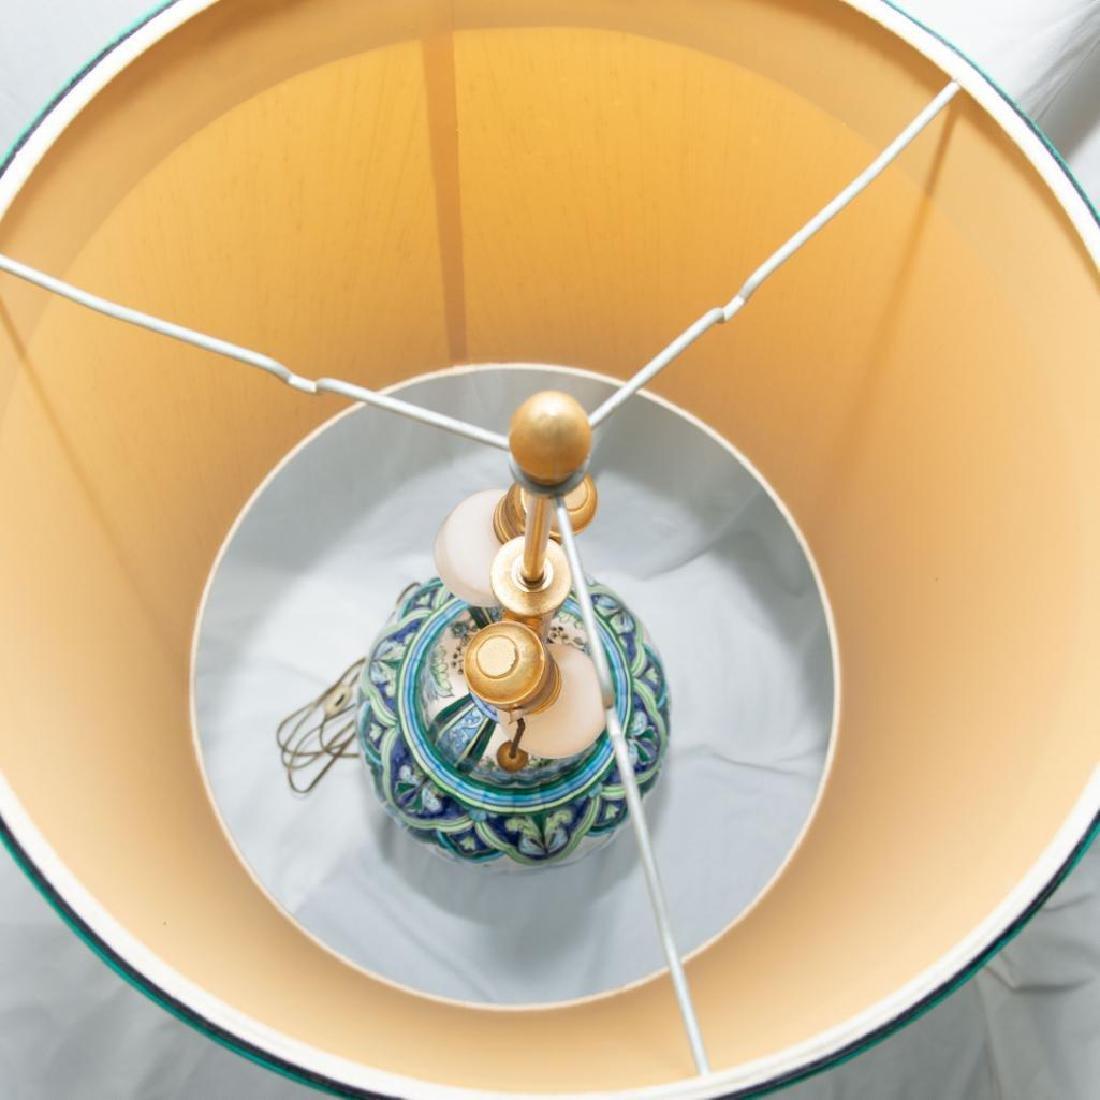 VINTAGE MARBRO CERAMIC TIN BRASS DUAL BULB DESK LAMP - 4